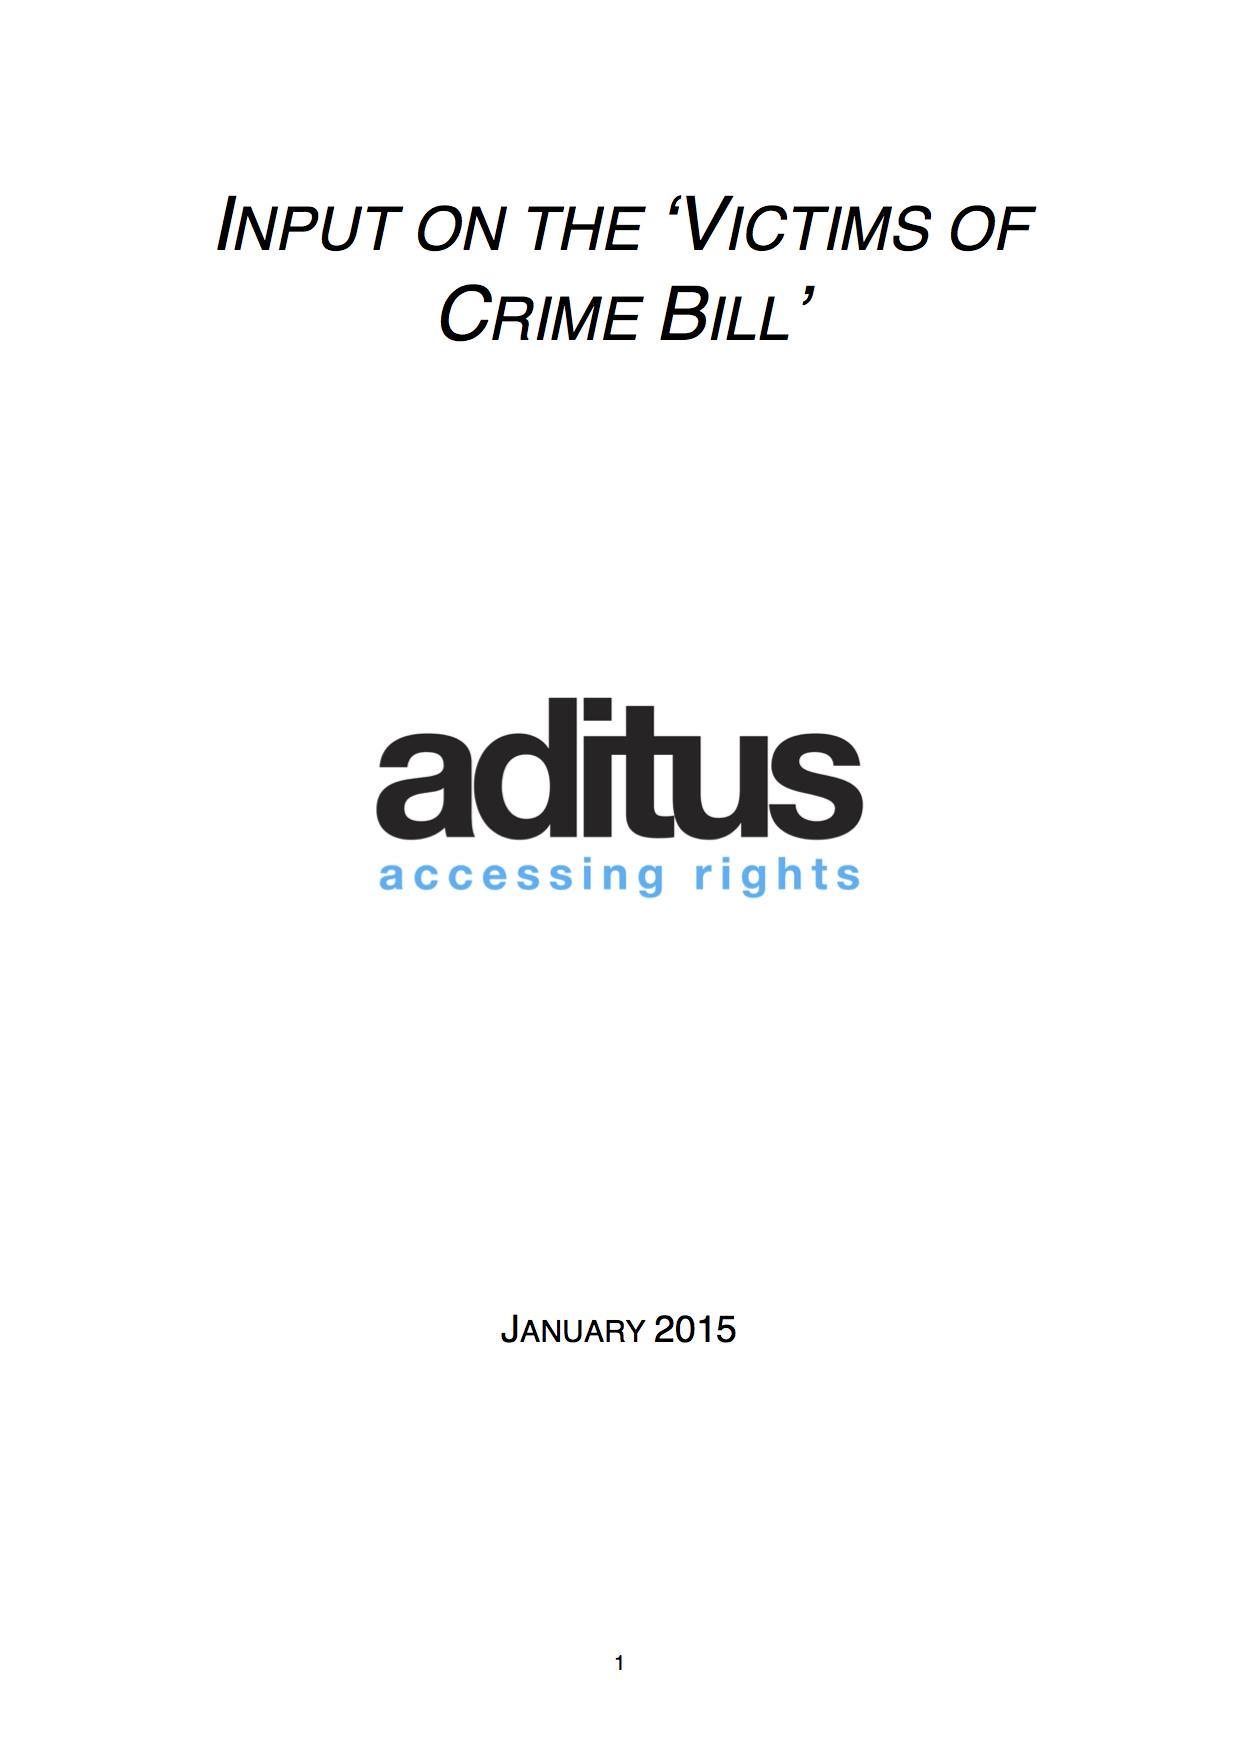 aditusinputvictimofcrime_cover